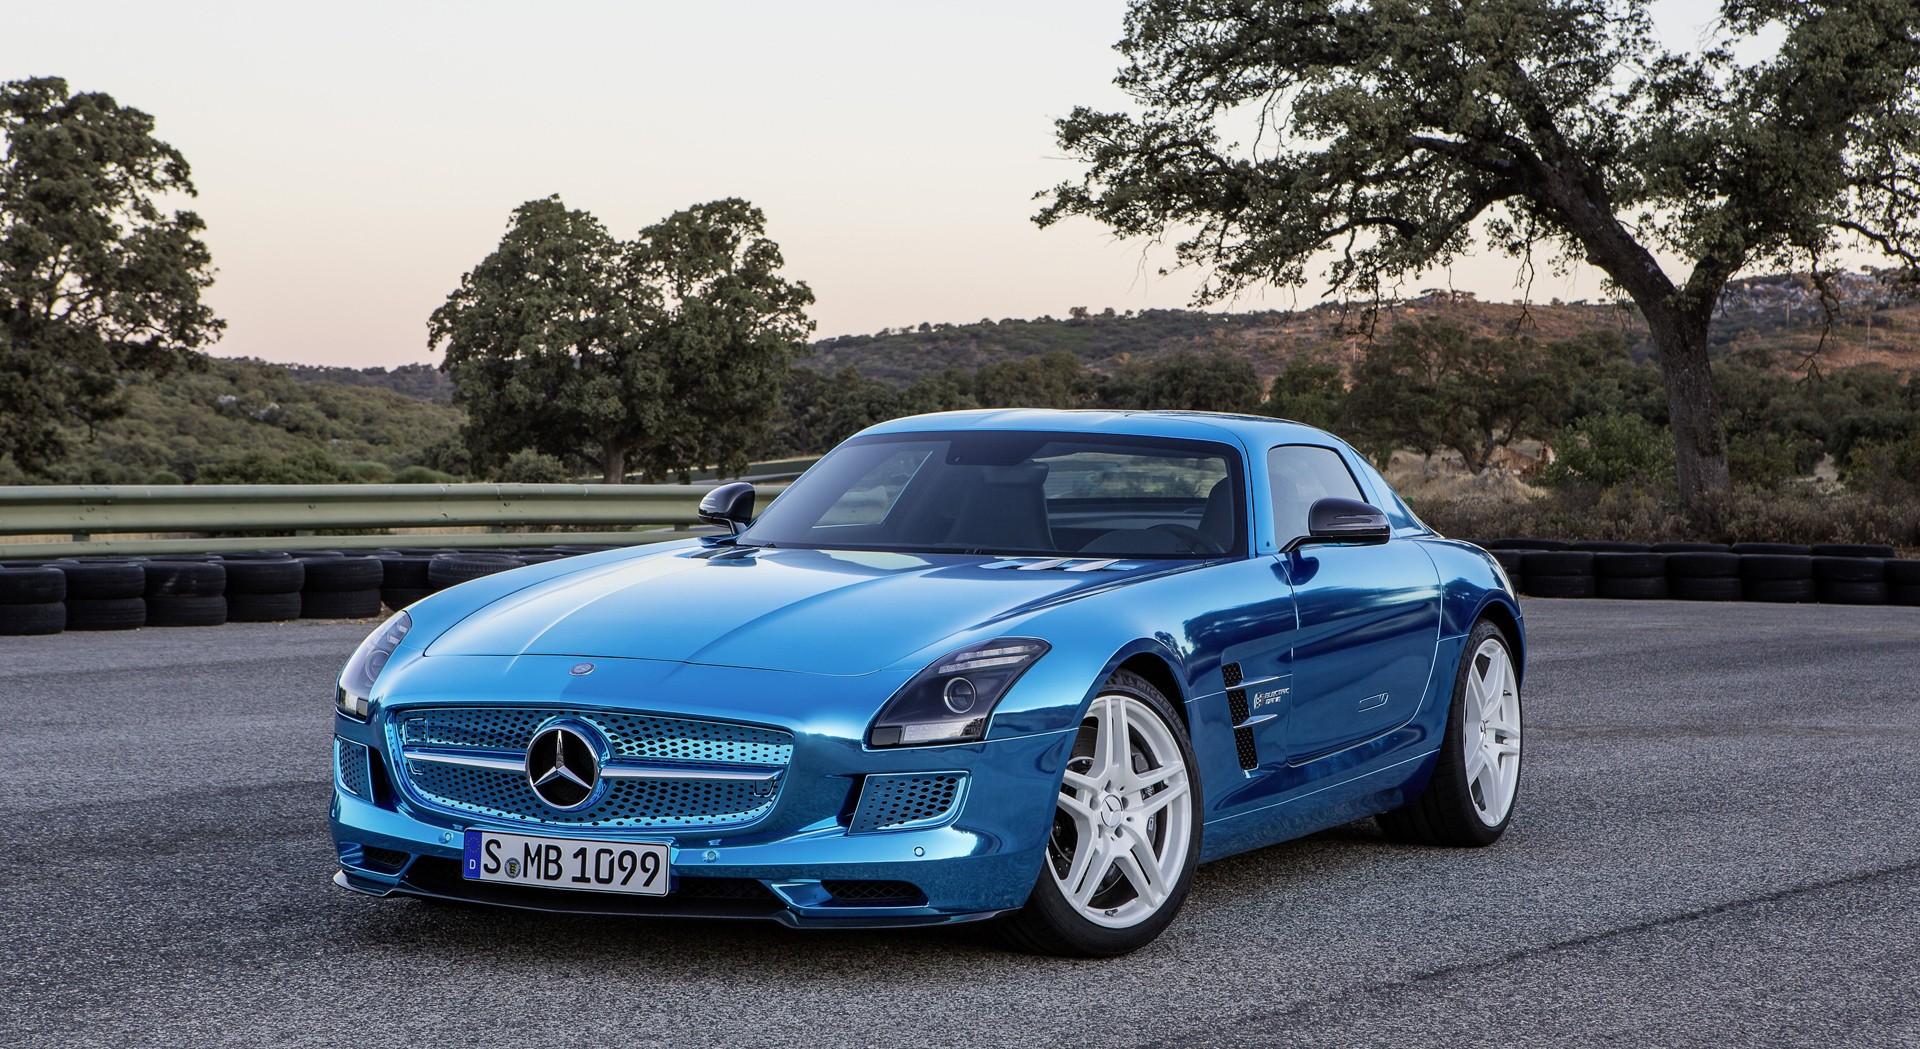 Spring Flowers 3d Live Wallpaper Mercedes Benz Sls Amg Blue Hd Desktop Wallpapers 4k Hd